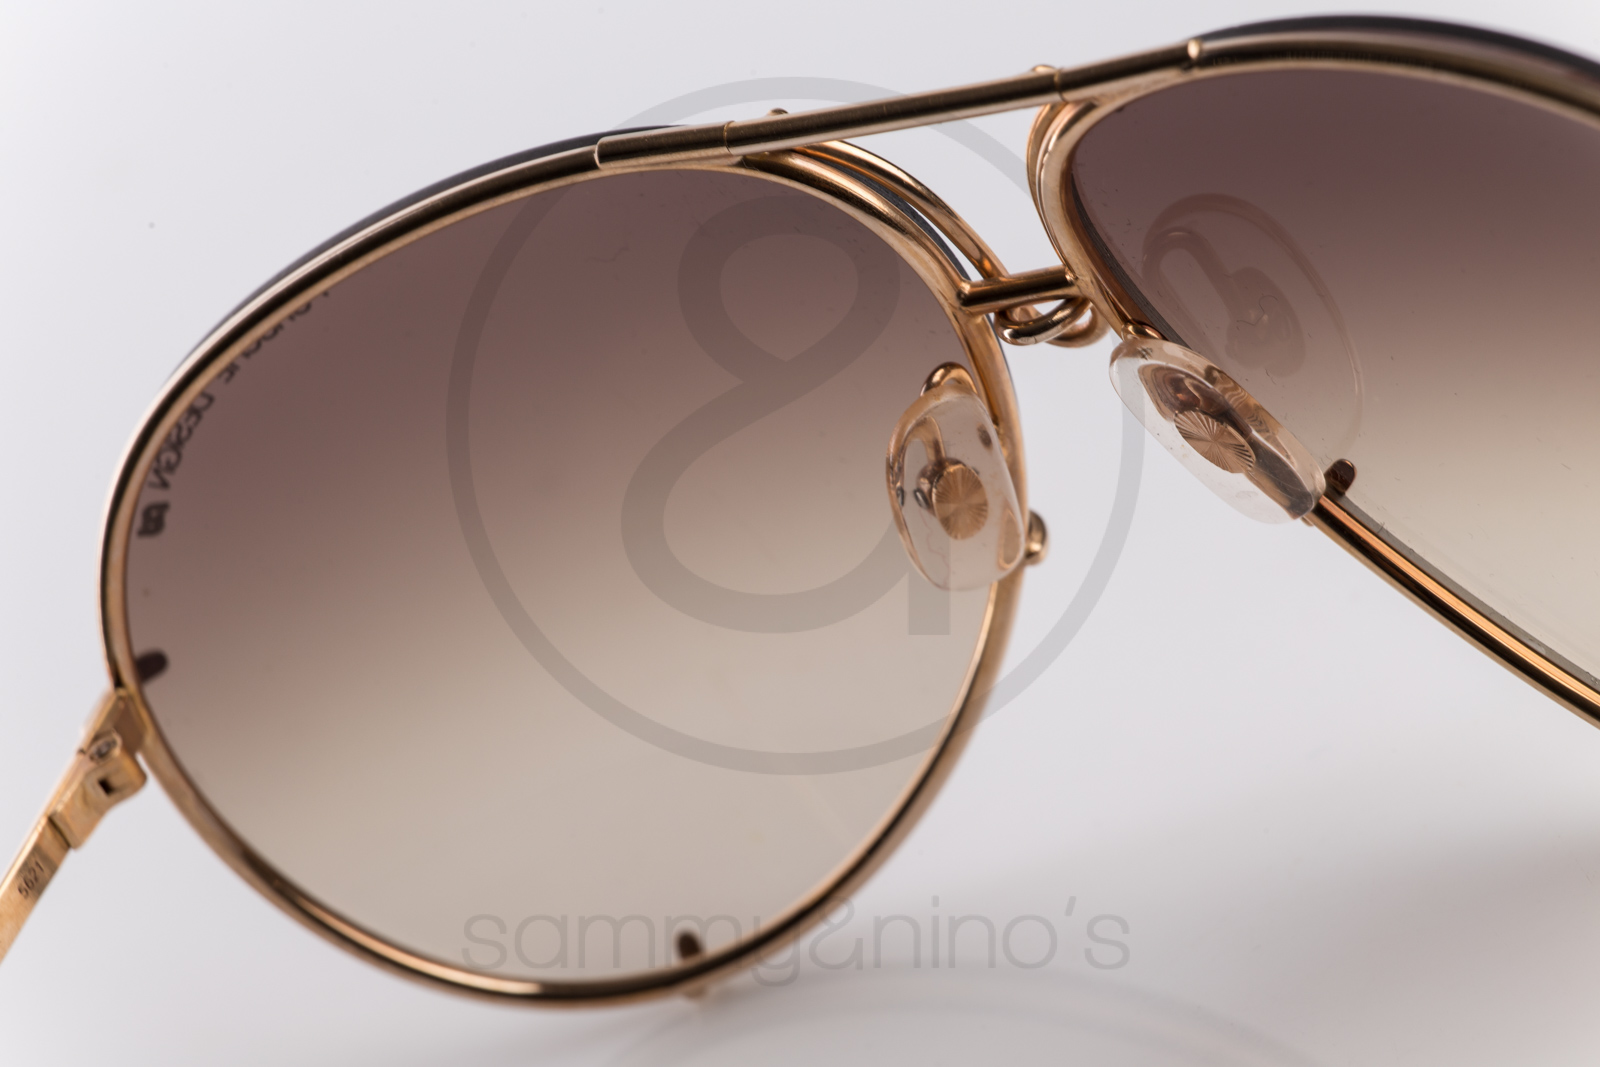 cf530f0c62 80 s Vintage Porsche Carrera Sunglasses